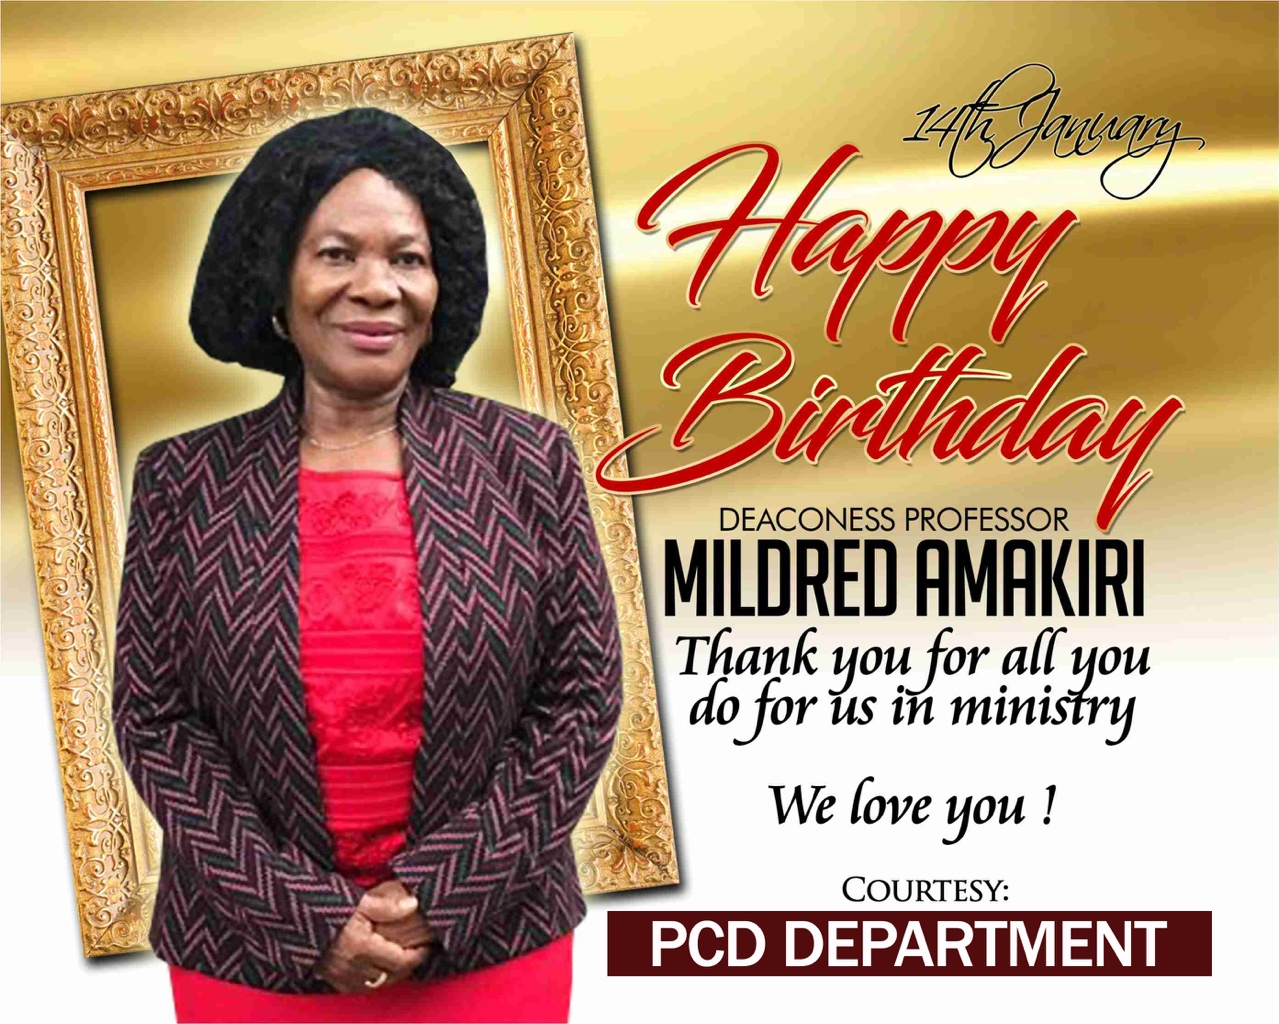 Happy Birthday Esteemed Dcns Amakiri